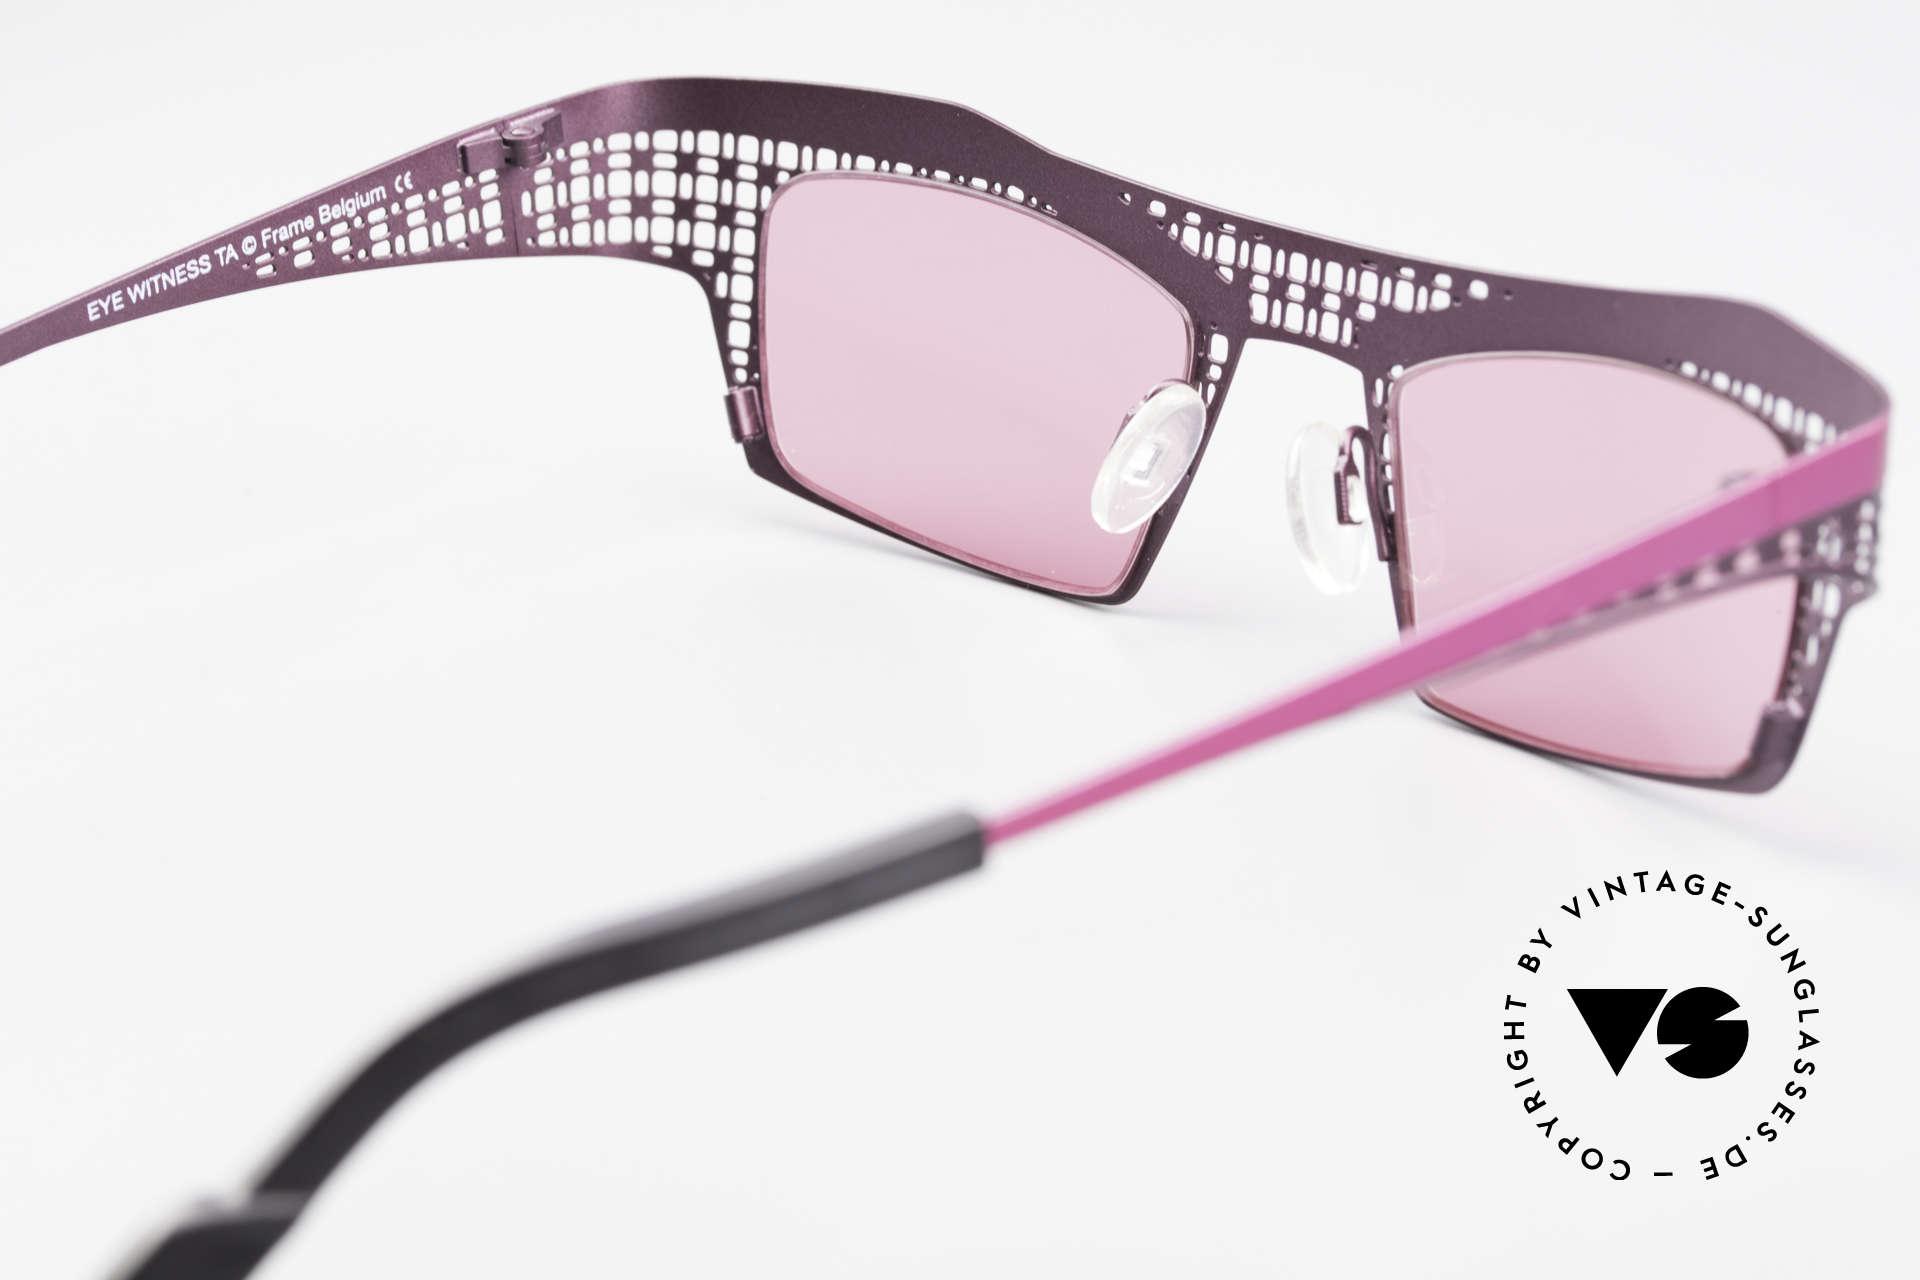 Theo Belgium Eye-Witness TA Avant-Garde Sunglasses Pink, so to speak: vintage eyeglasses with representativeness, Made for Women